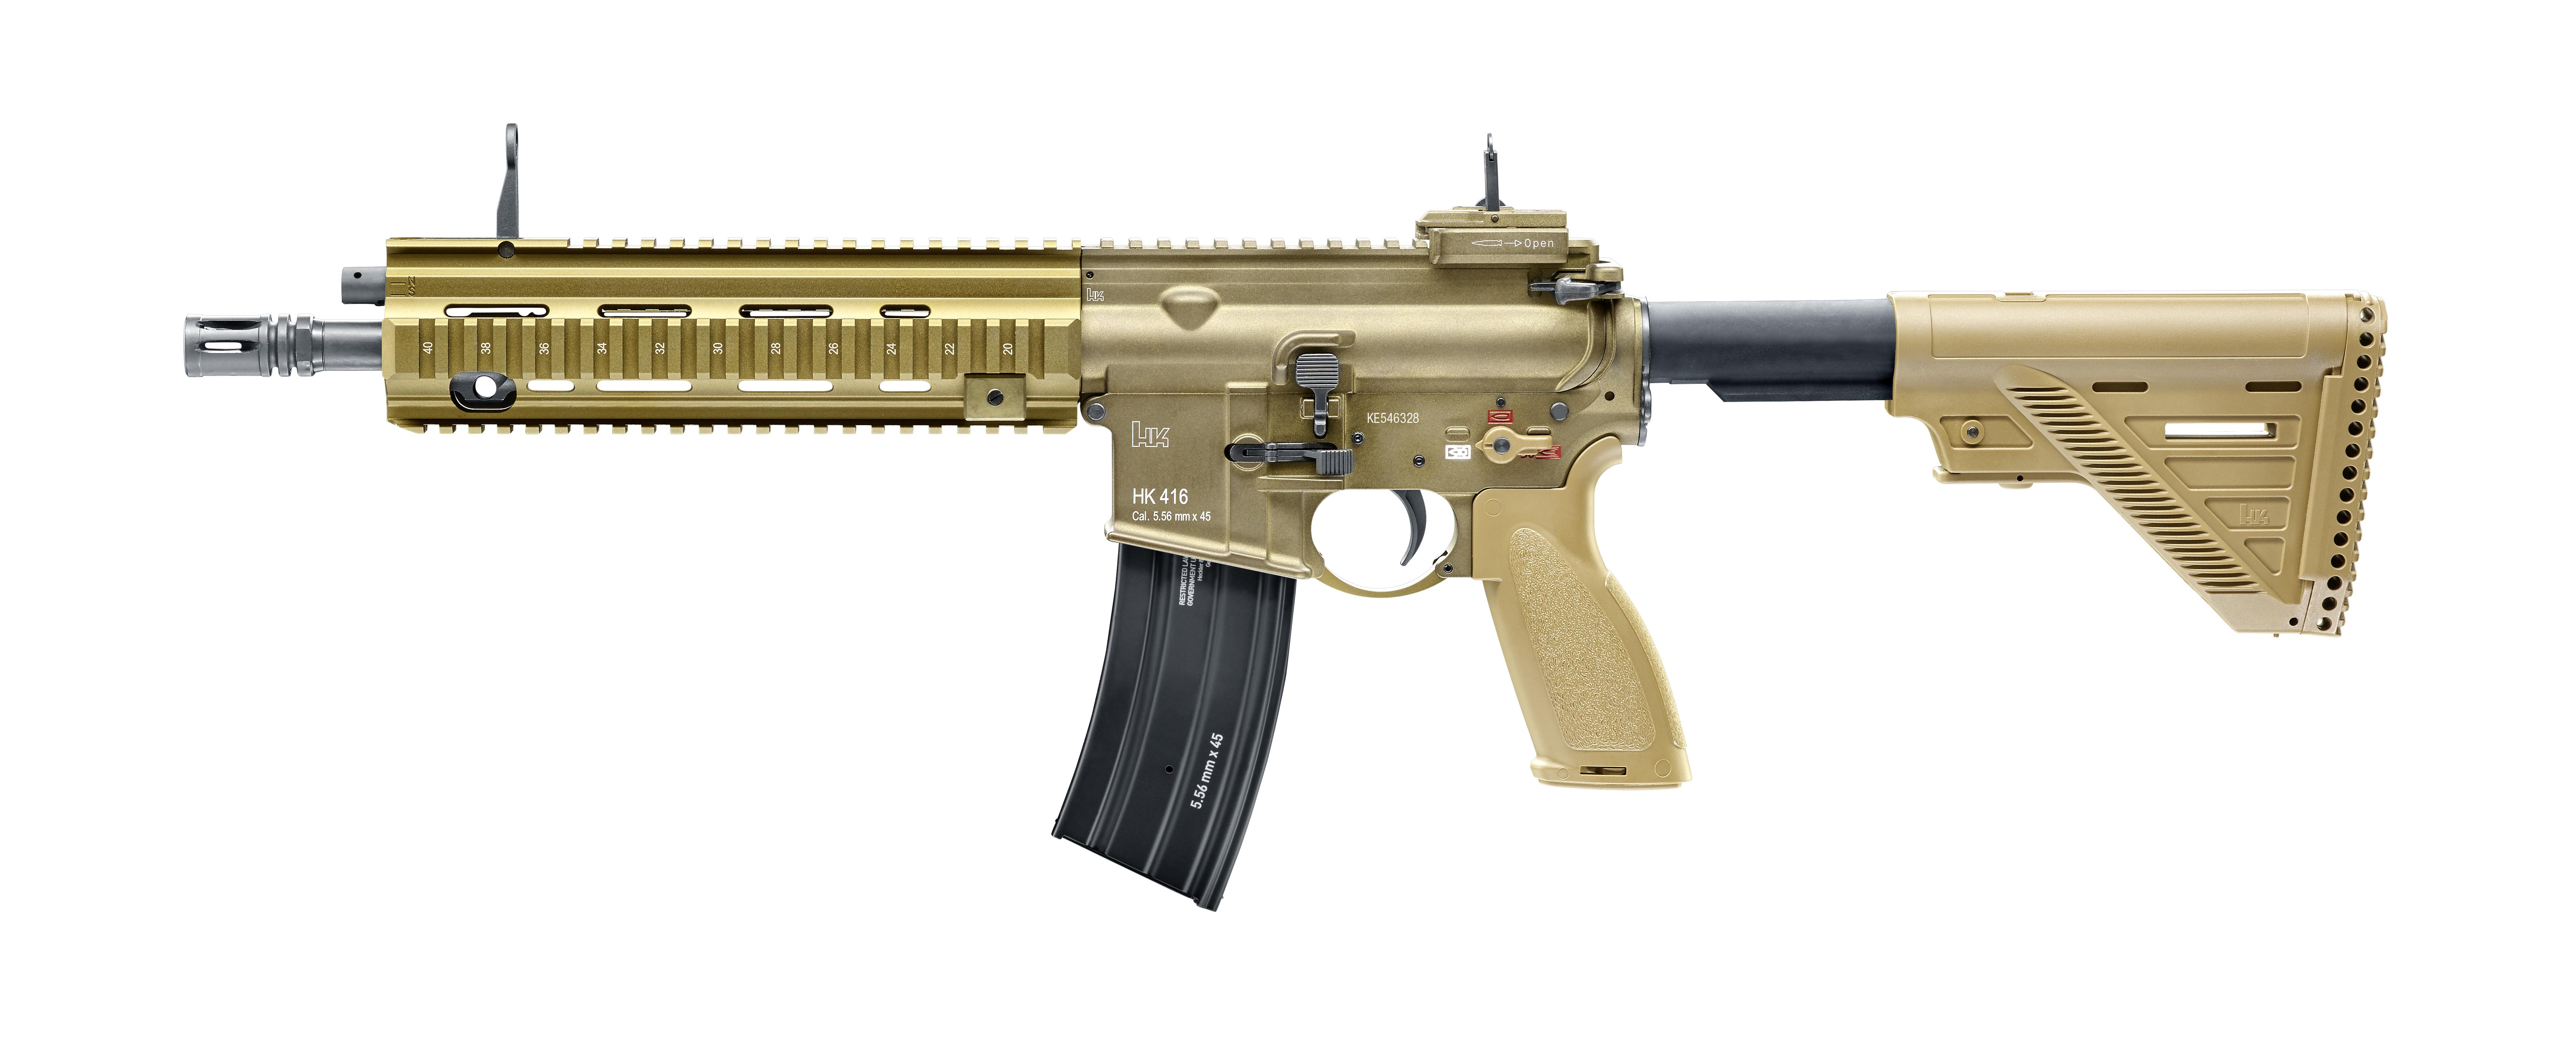 HECKLER & KOCH (Umarex) AEG Rifle HK416 A5